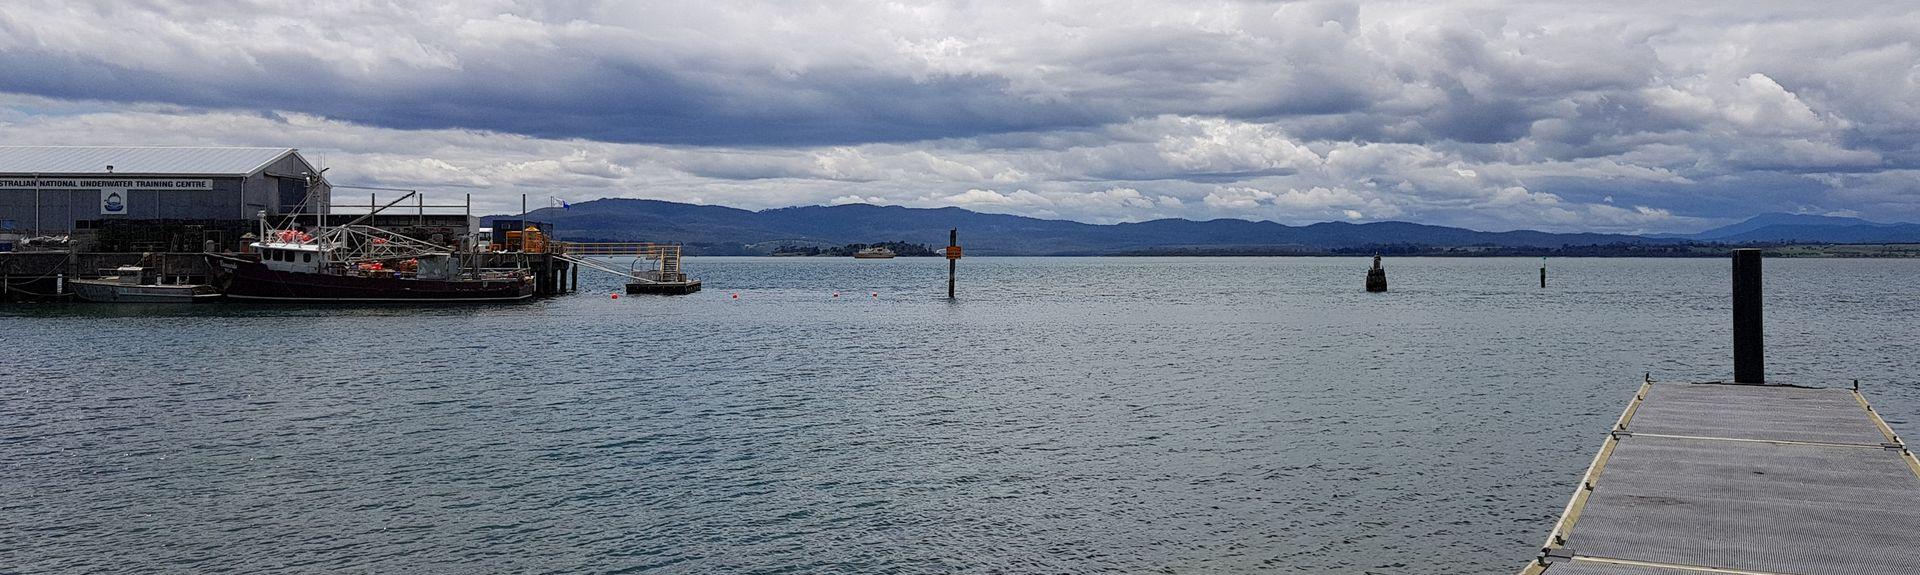 Seahorse World, Beauty Point, Tasmanië, Australië